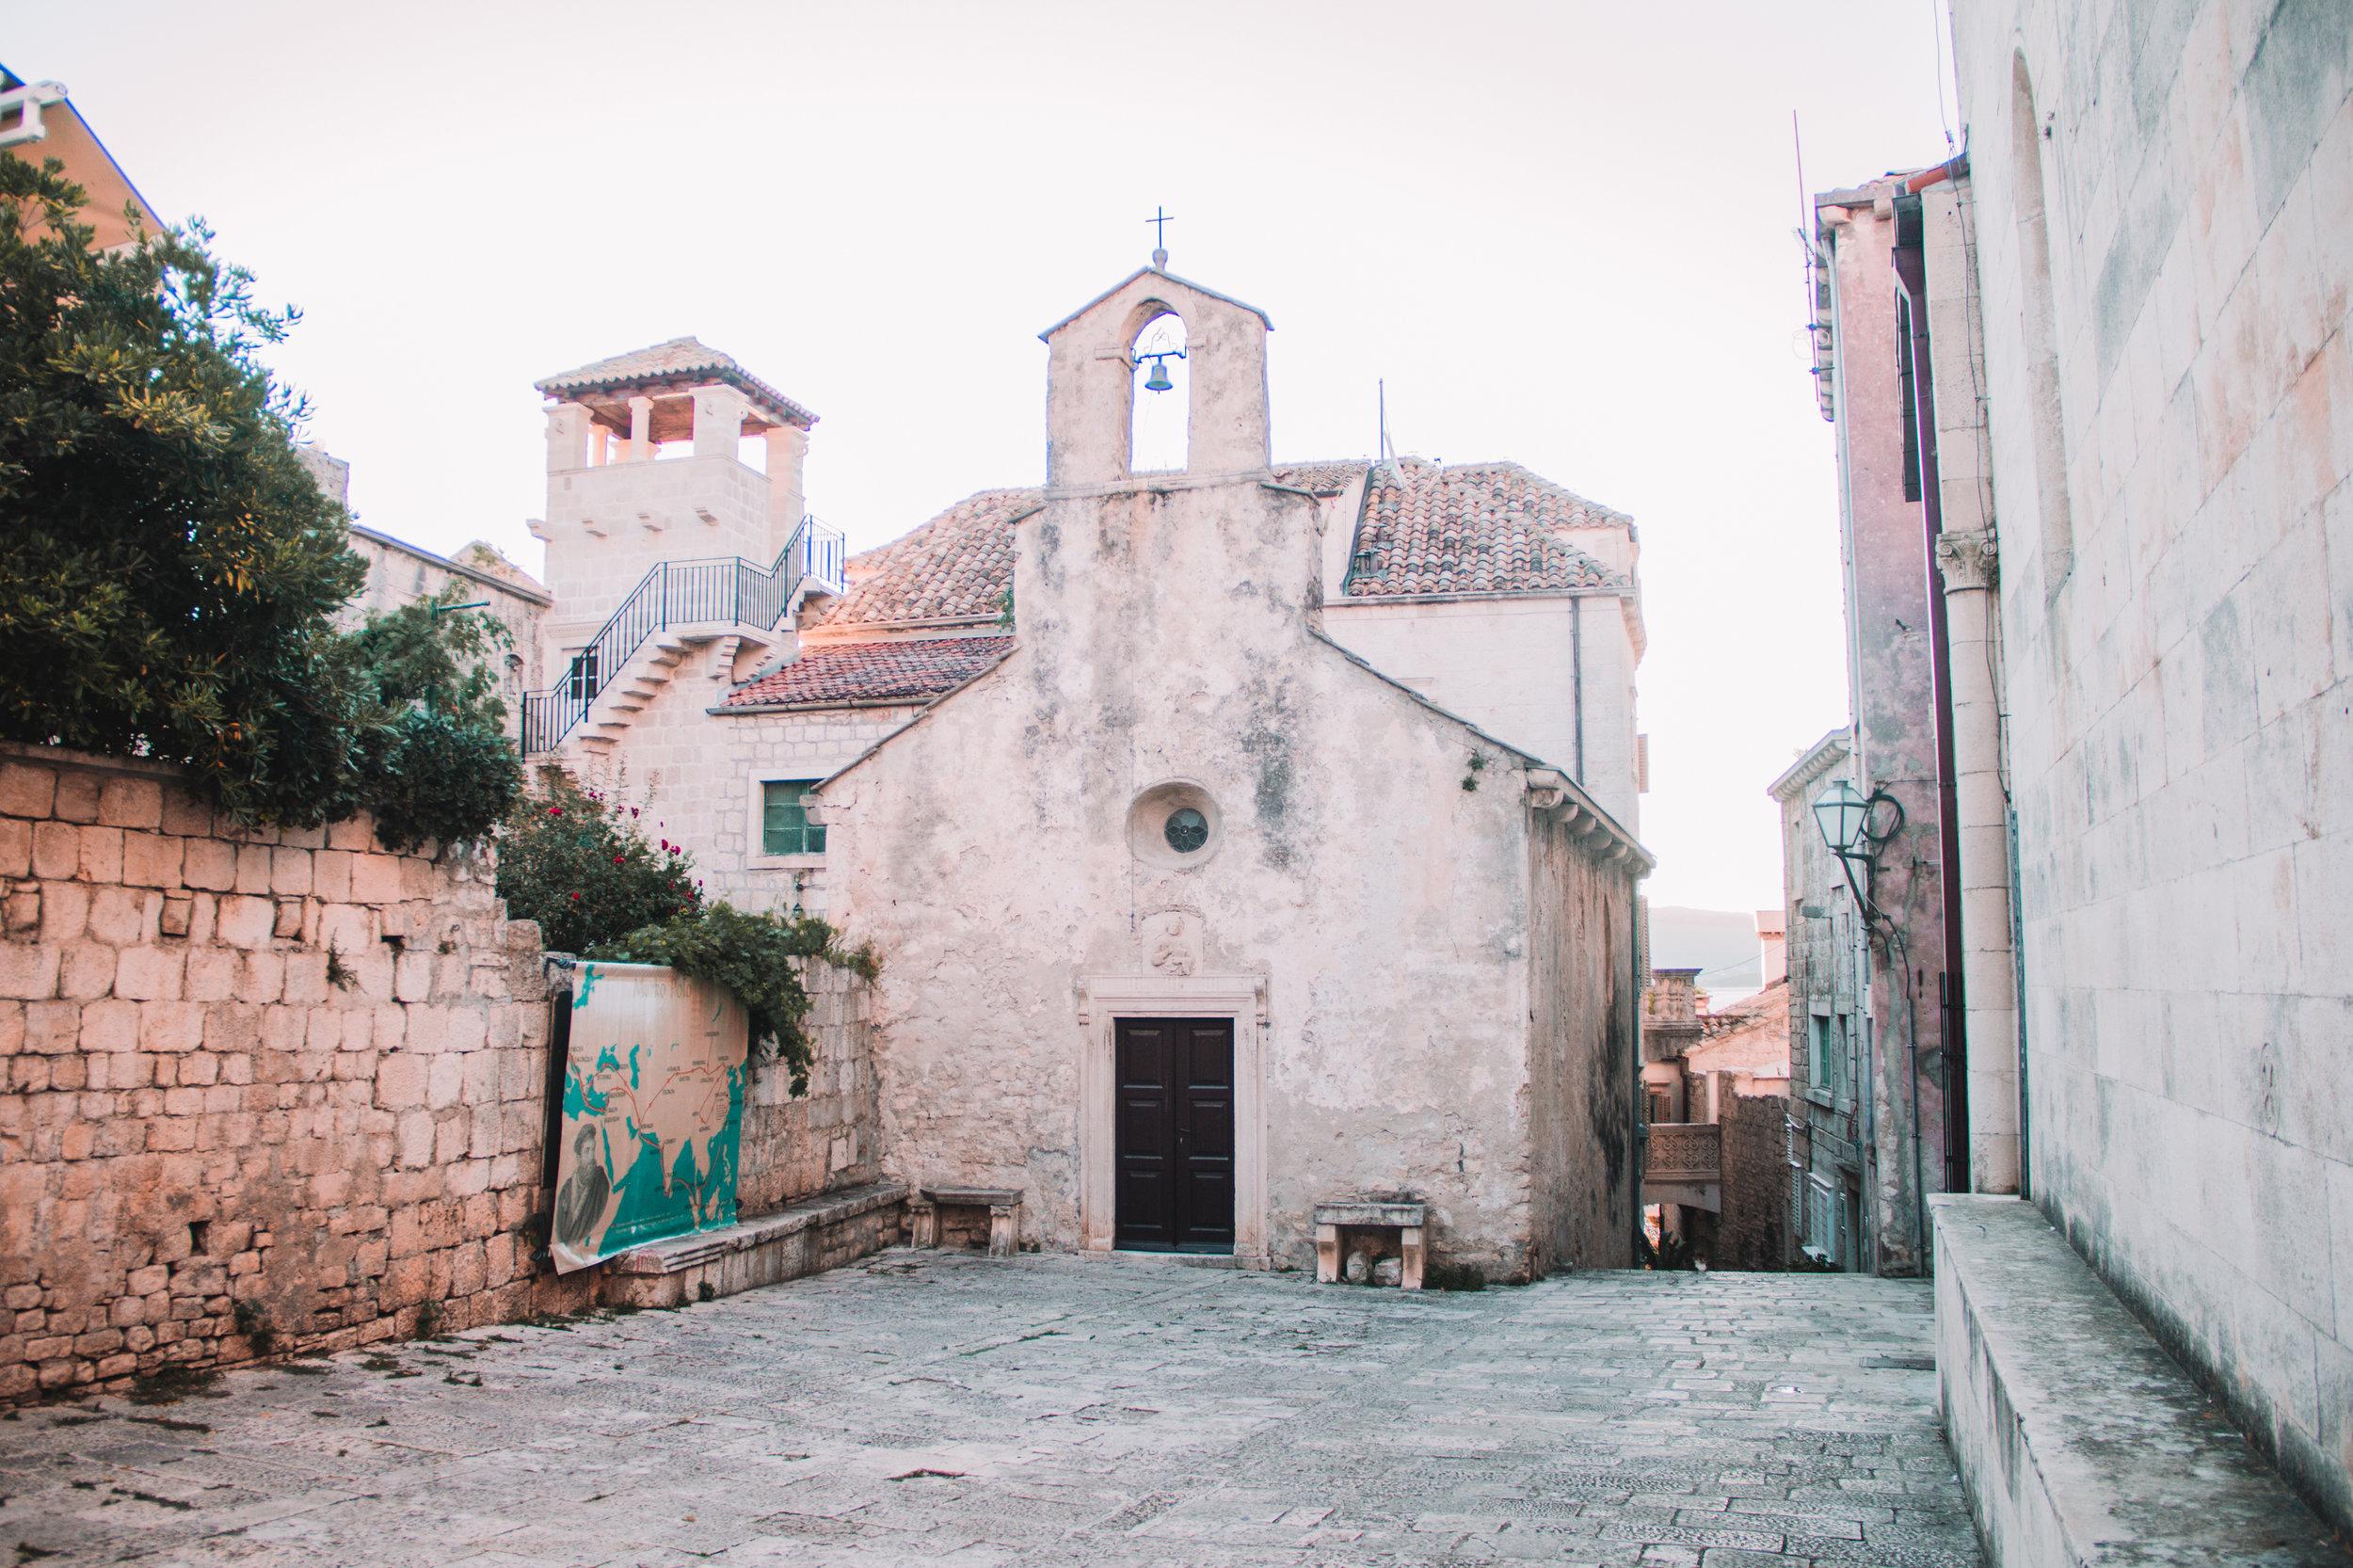 Travel Bloggers Guide to Korcula Croatia-31.jpg